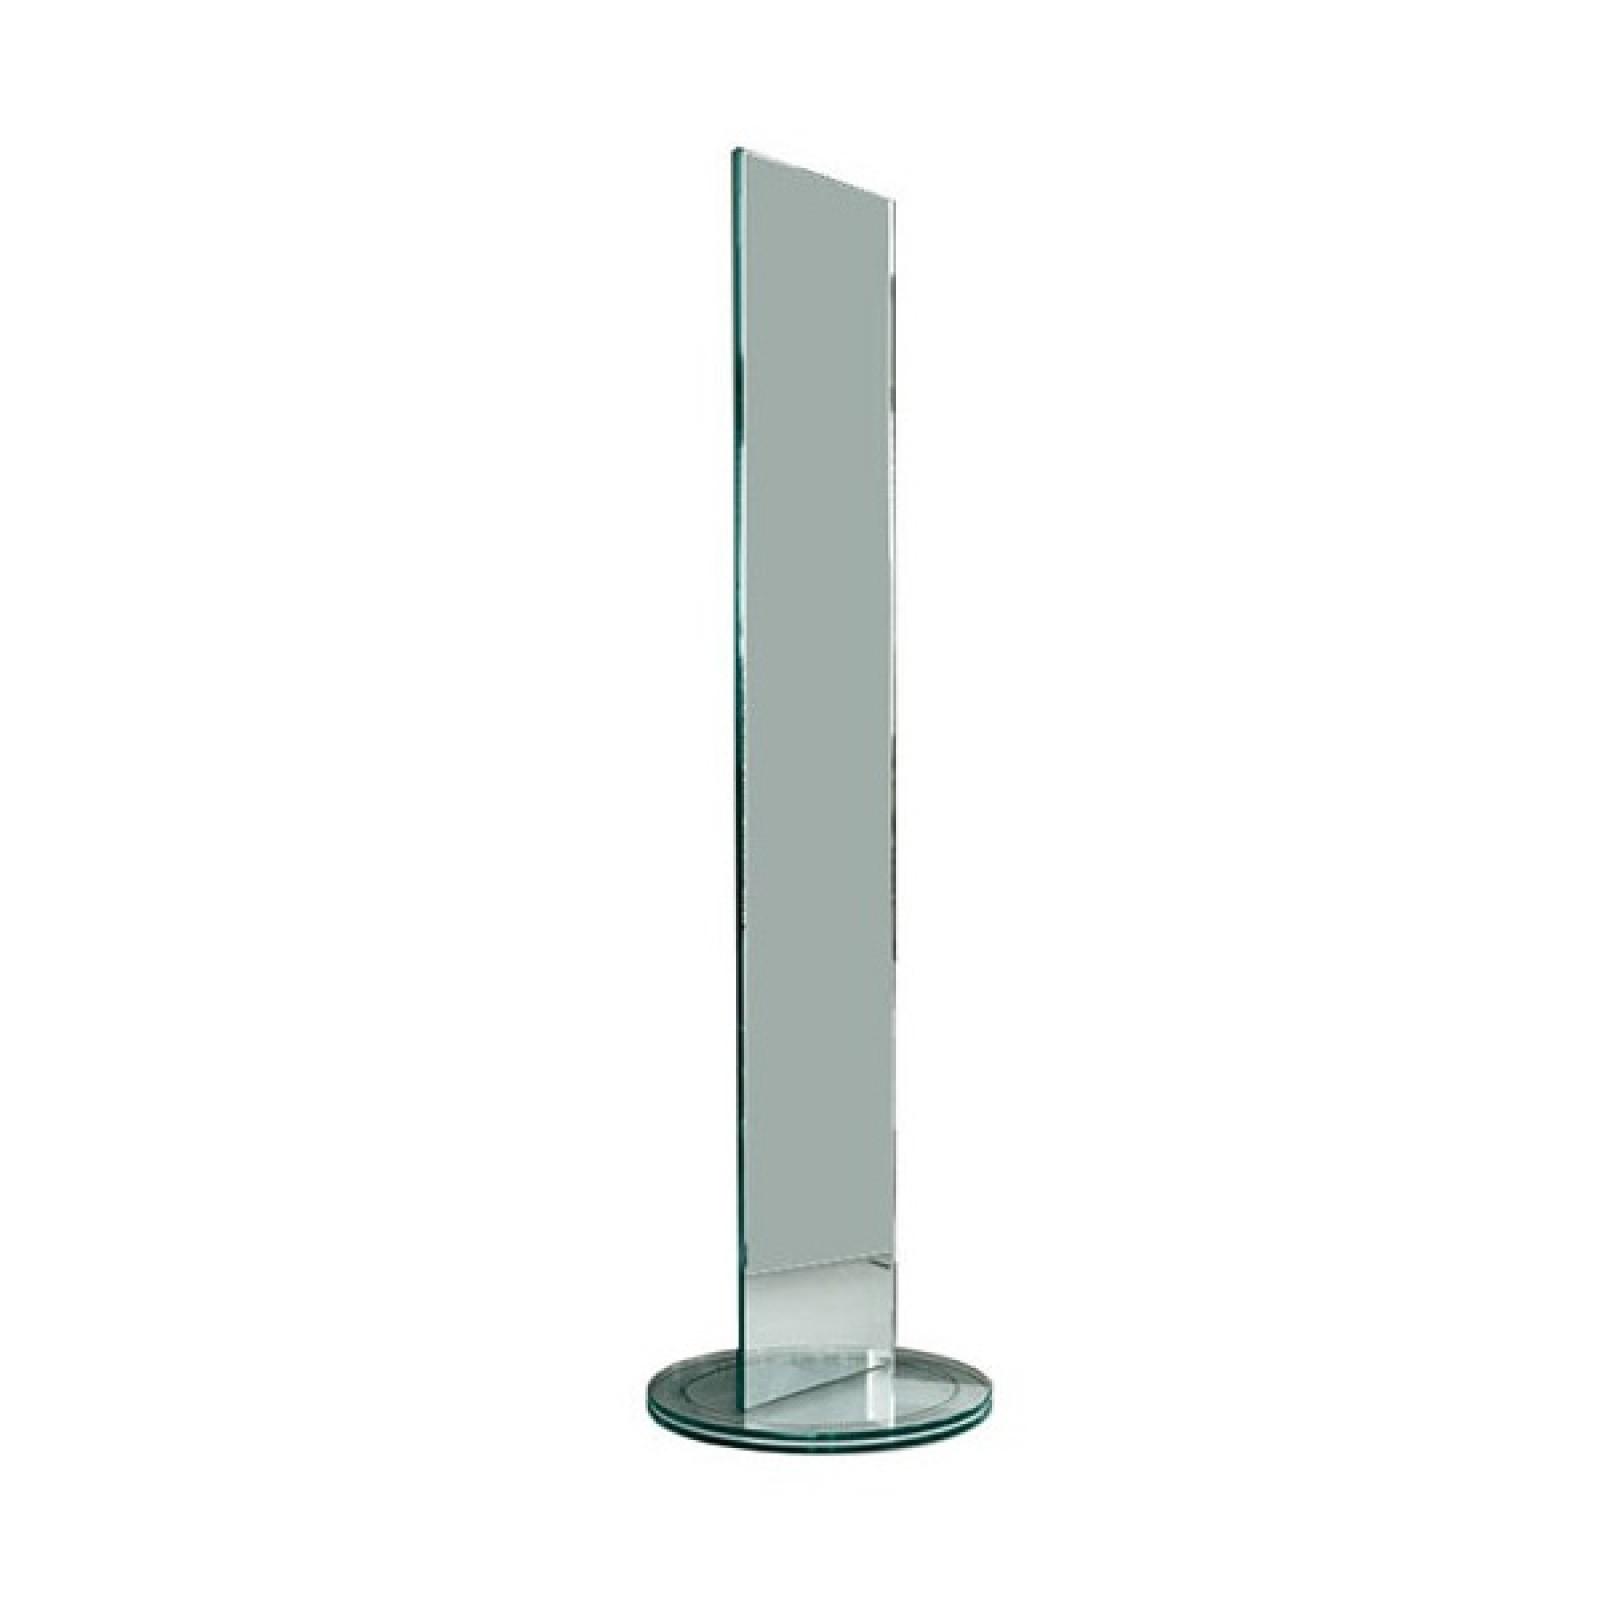 Soglia Revolving Floor Standing Mirror - Tonelli Design